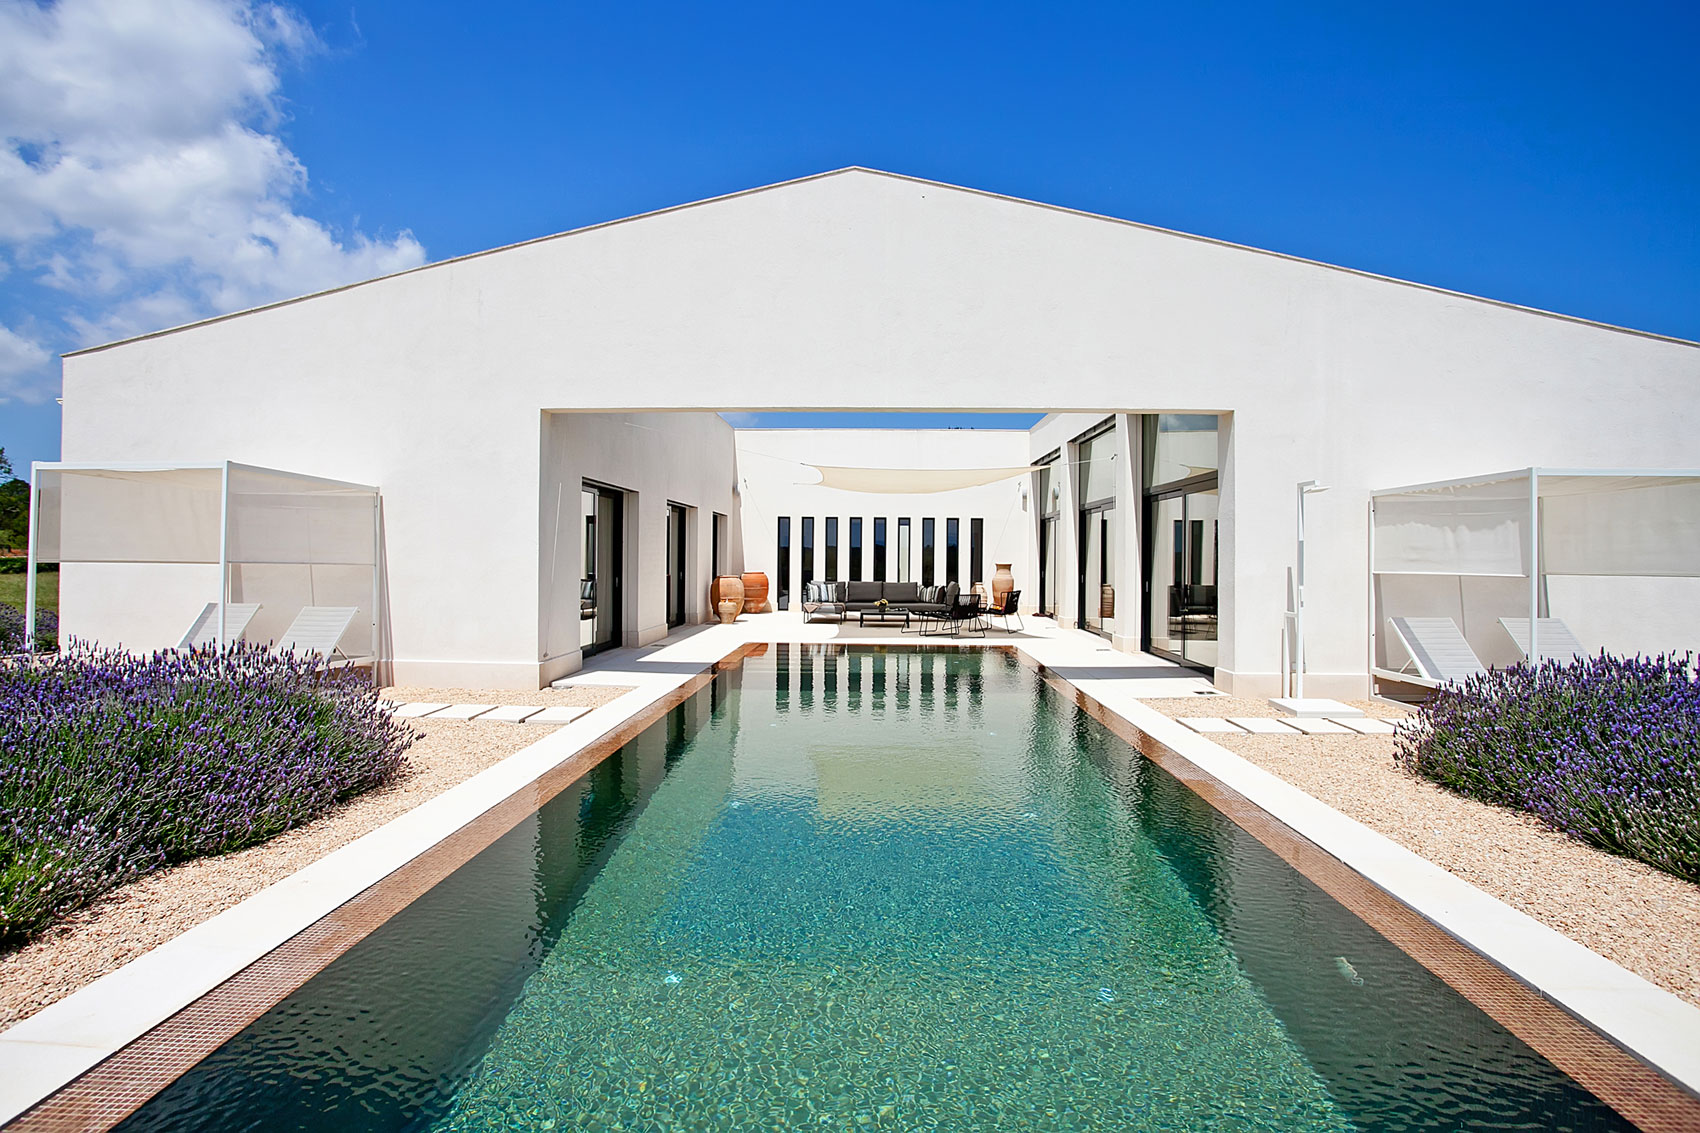 A Holiday Home in Mallorca by ecoDESIGNfinca